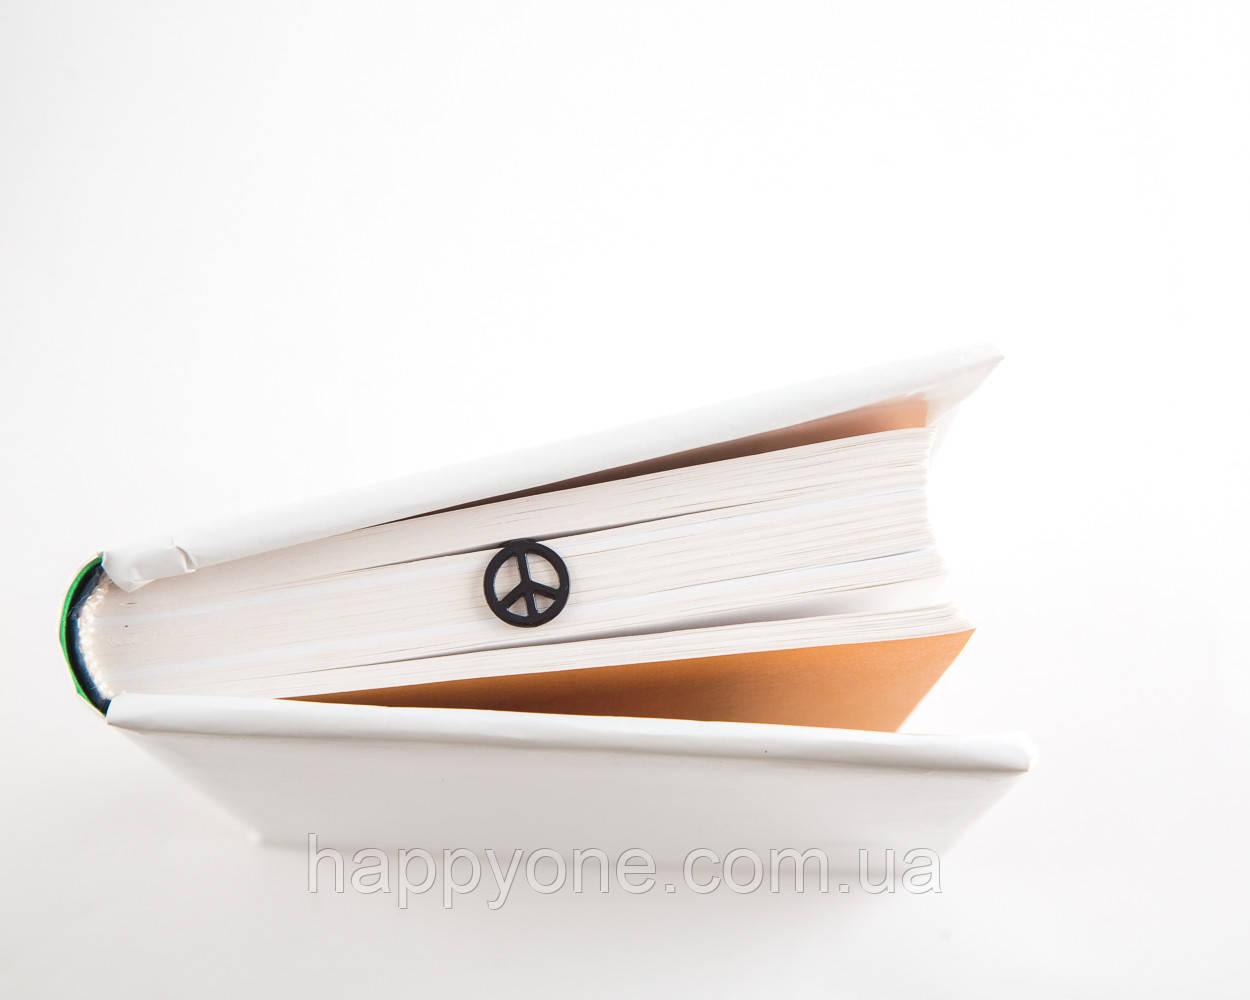 Закладка для книг Peace